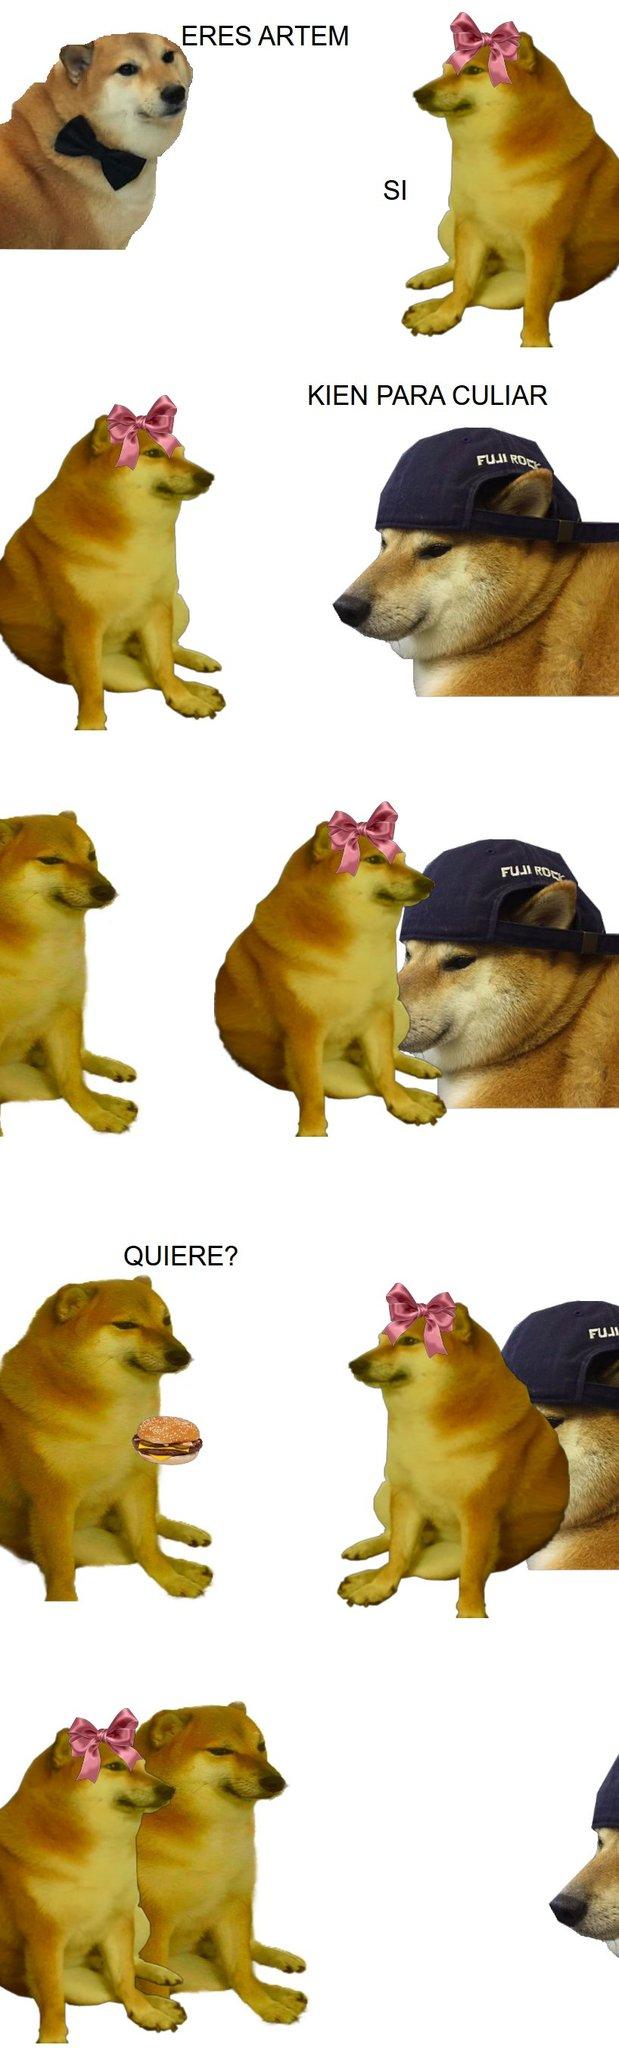 gramde cheems - meme